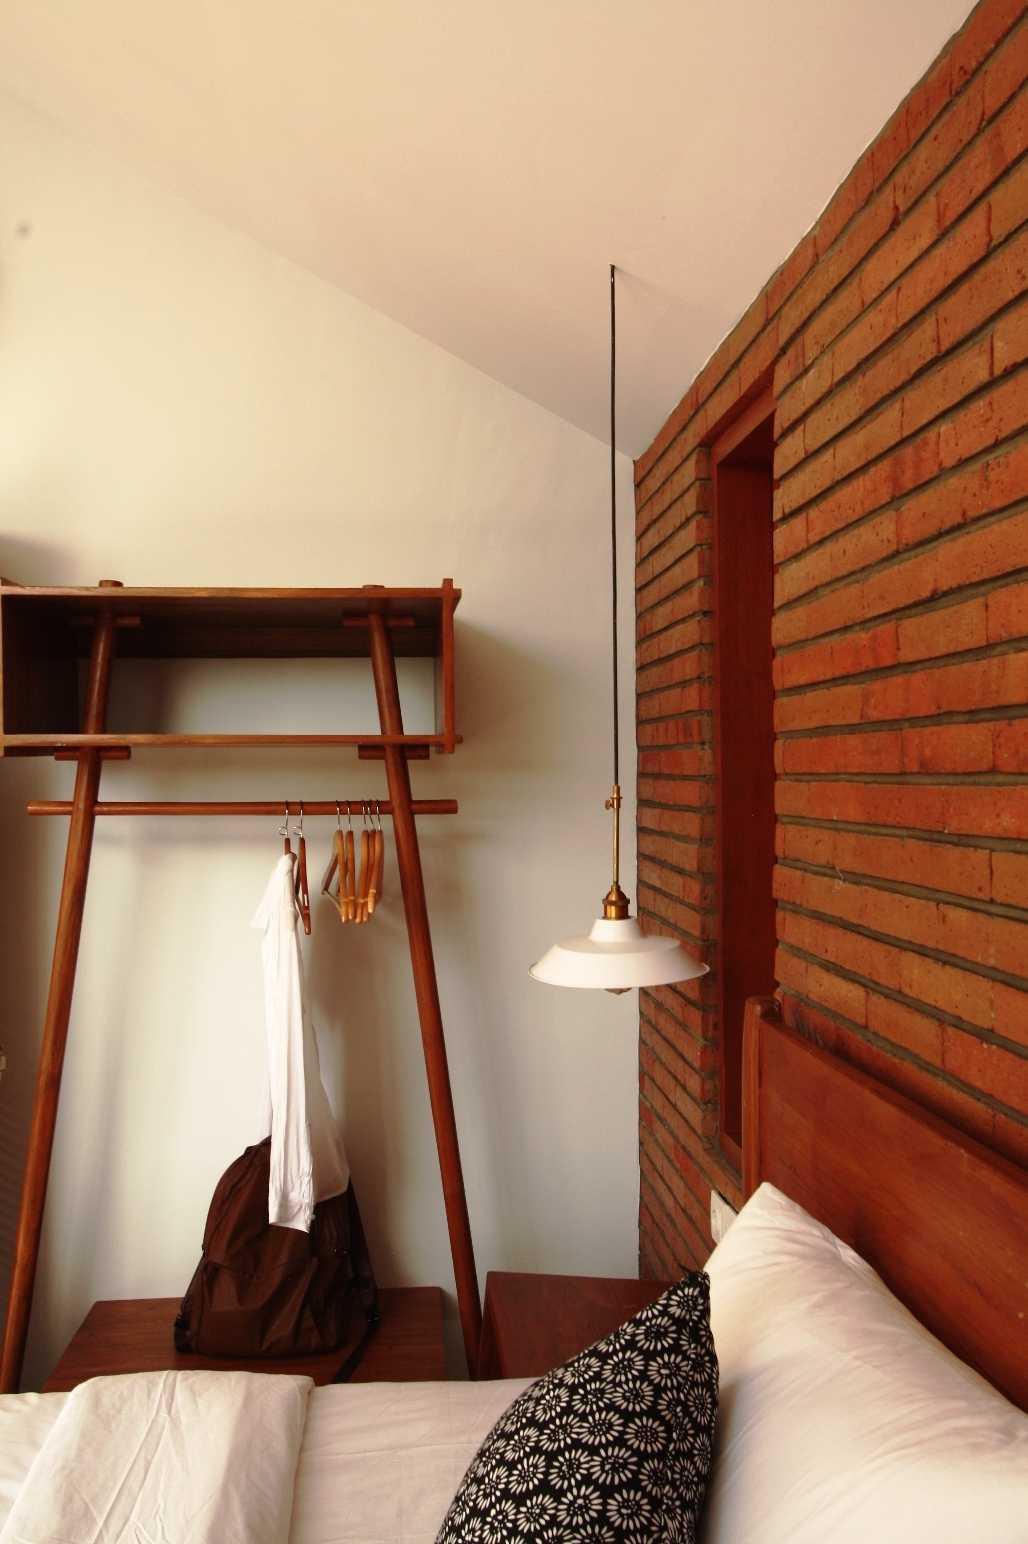 Ddap Architect Kubu Tropis Lodge Accommodation Ubud, Kabupaten Gianyar, Bali, Indonesia Bali Img0718 Tropis  28531